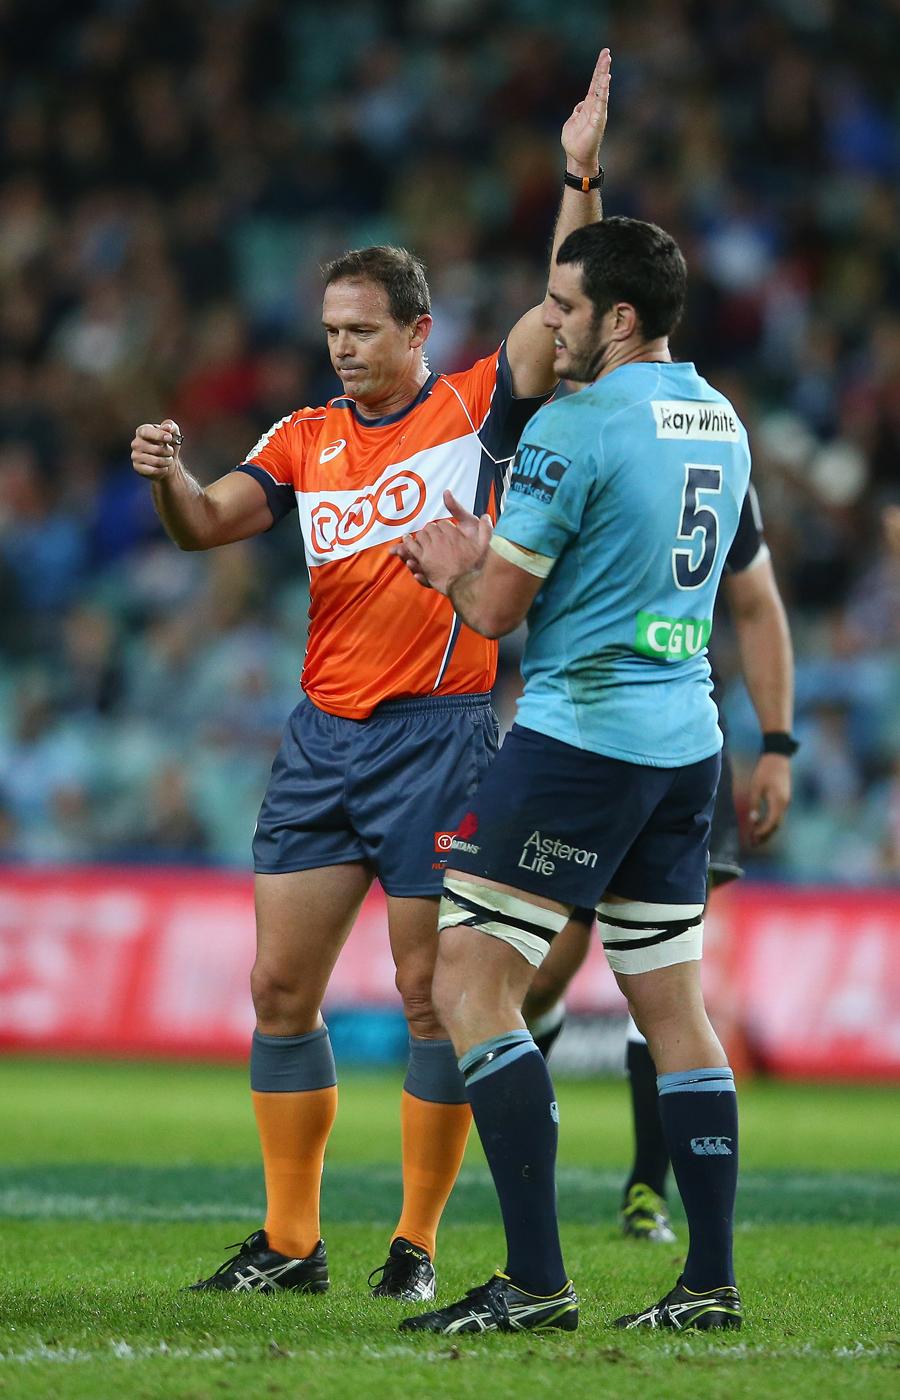 Referee Rohan Hoffmann awards a penalty against the Sharks, Waratahs v Sharks, Super Rugby, Allianz Stadium, Sydney, May 16, 2015